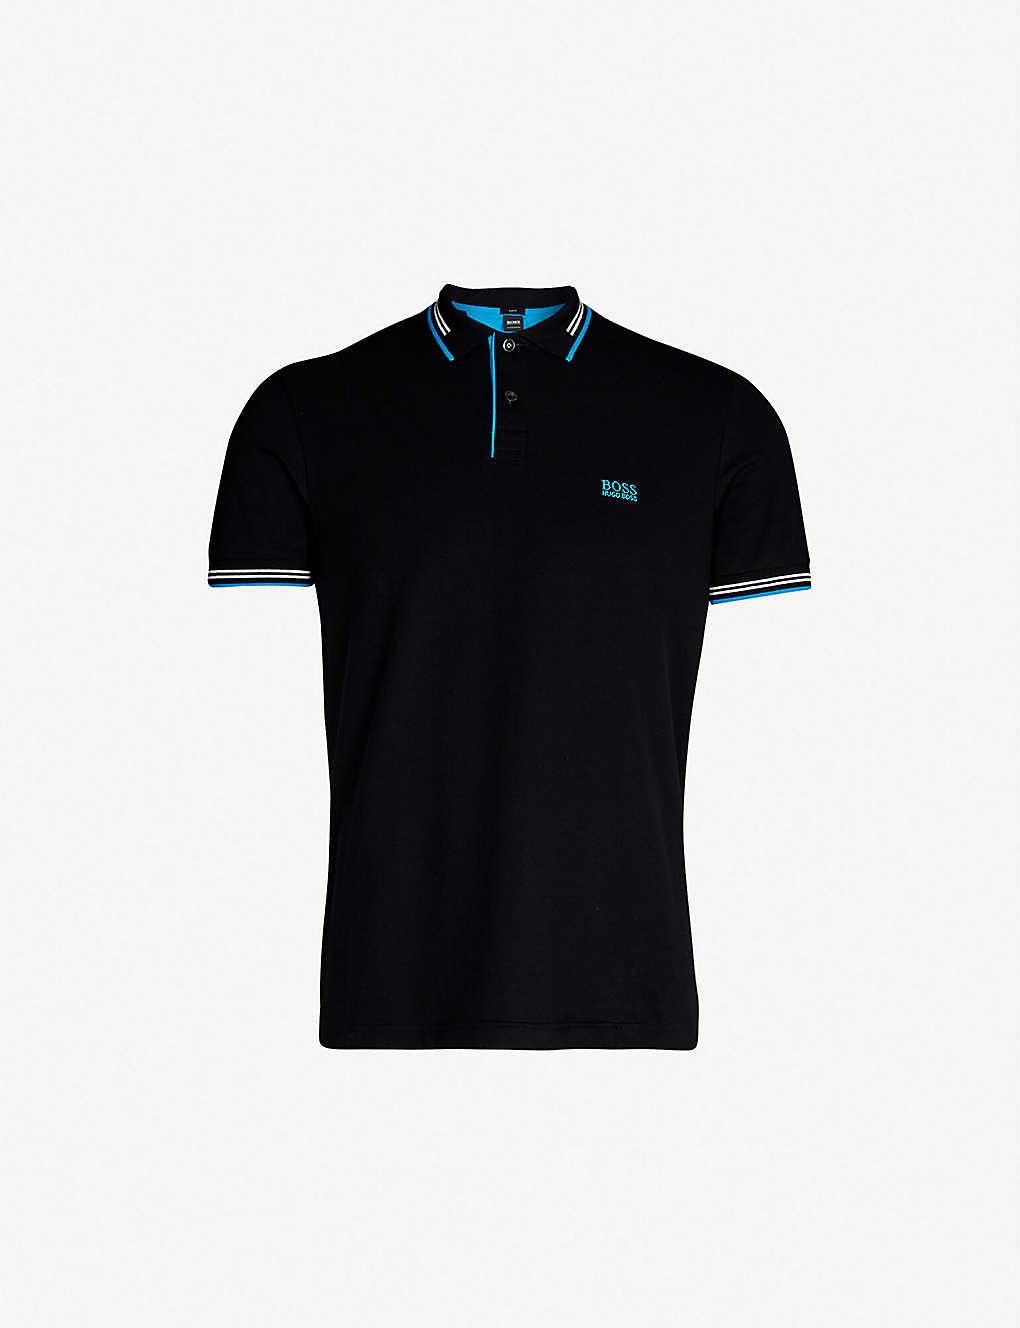 cdfa9d4c BOSS - Tipped cotton-piqué polo shirt | Selfridges.com